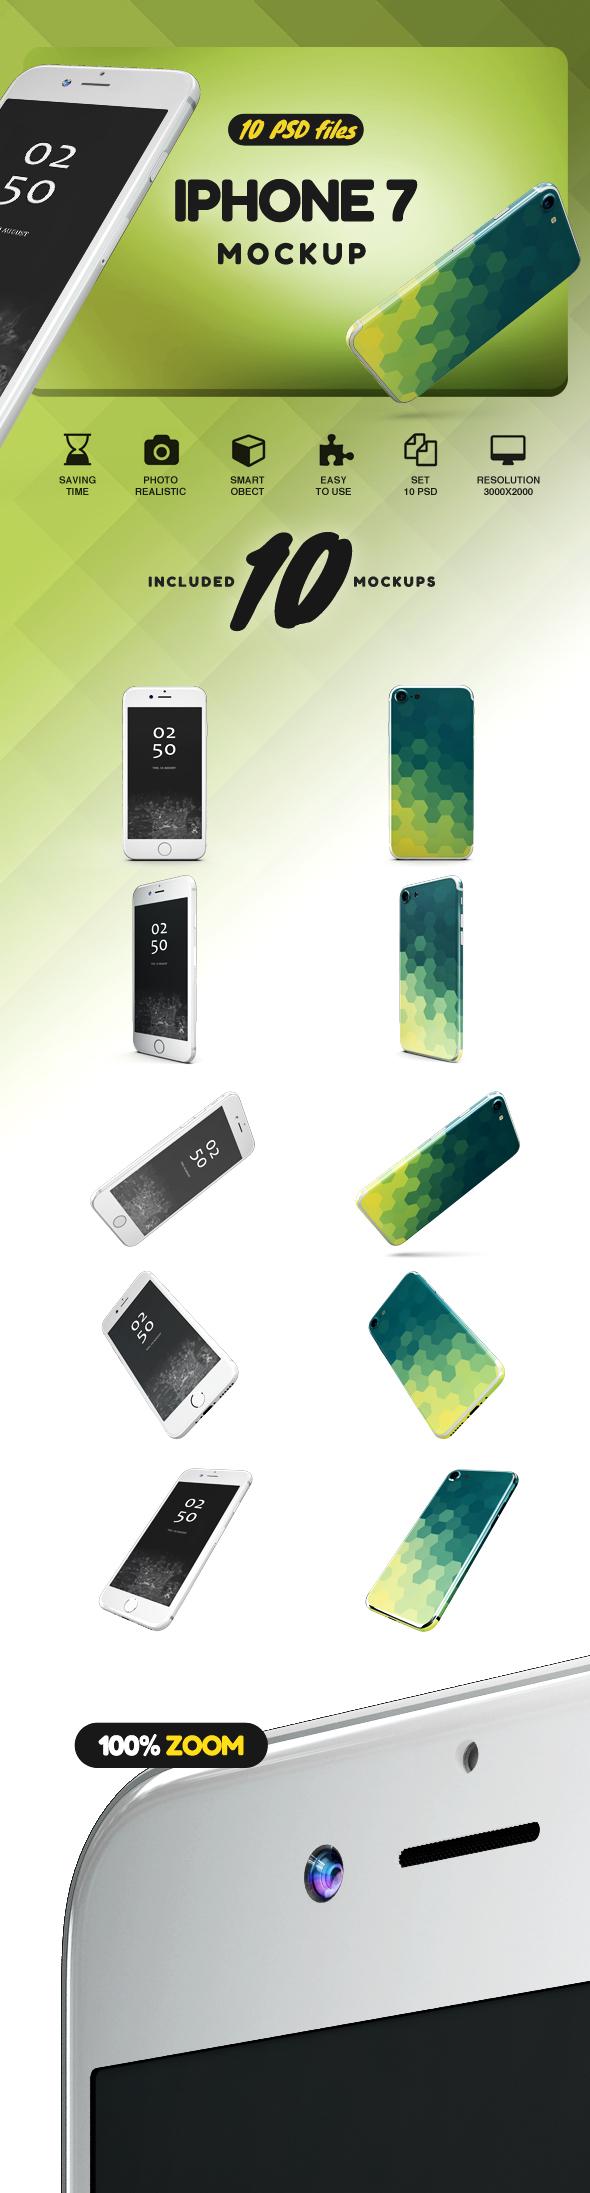 iPhone 7 Jet Black Edition Mockup example image 2